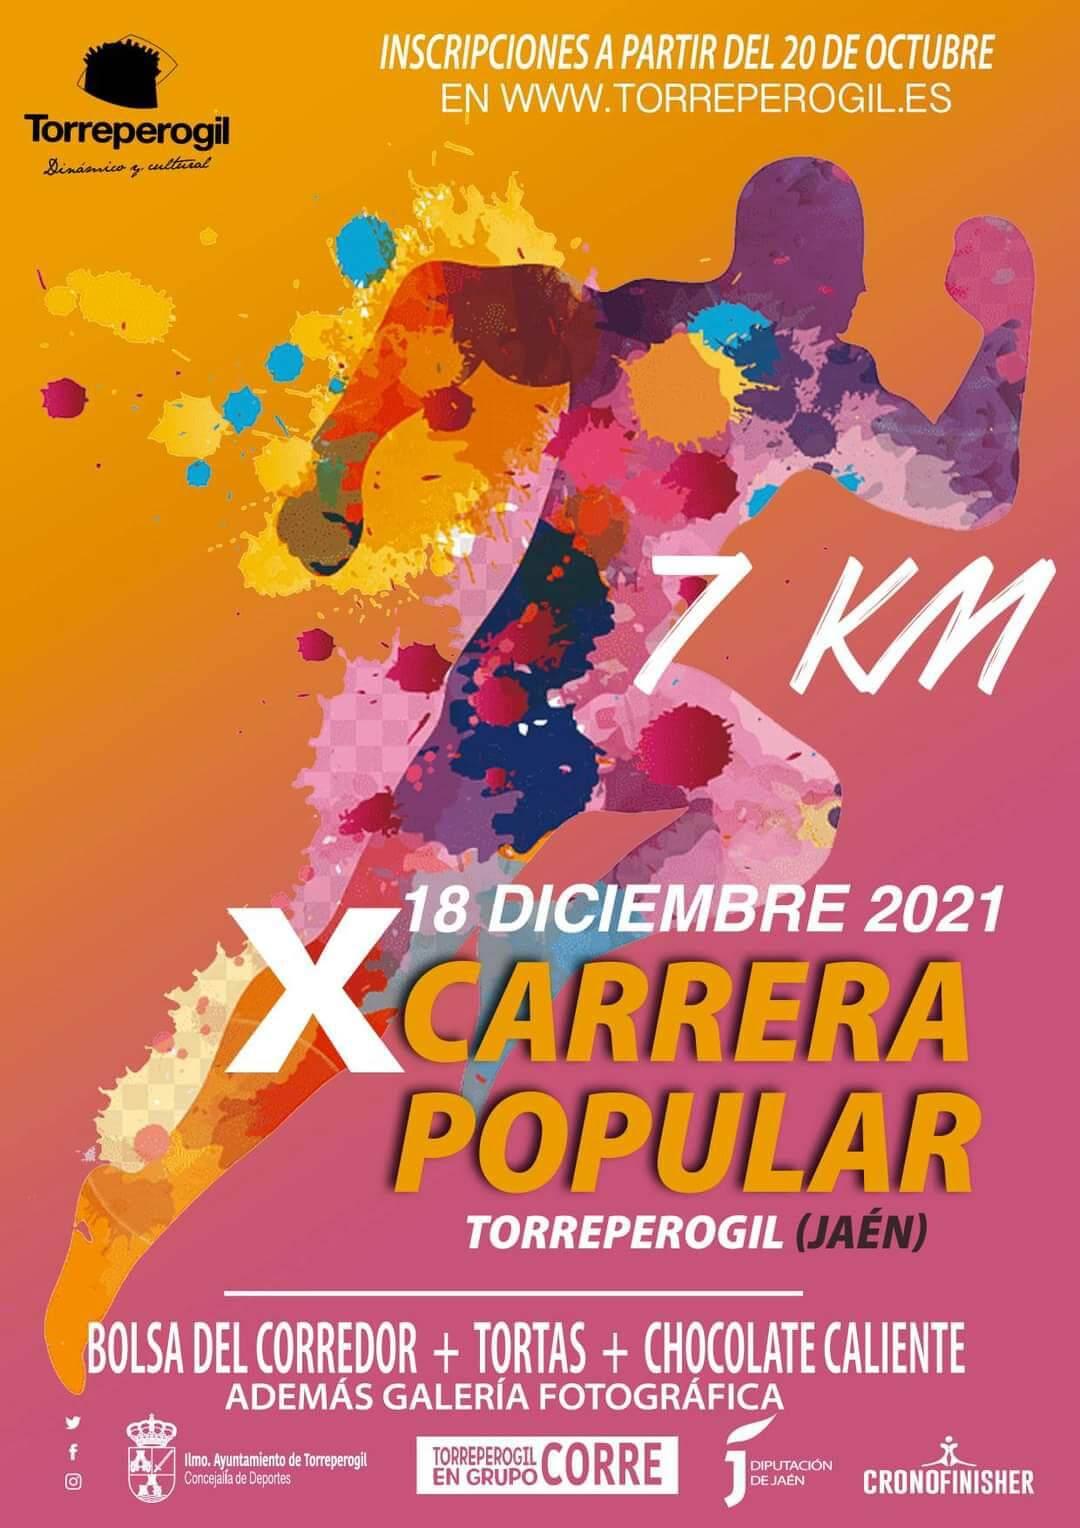 Carrera Popular Torreperogil